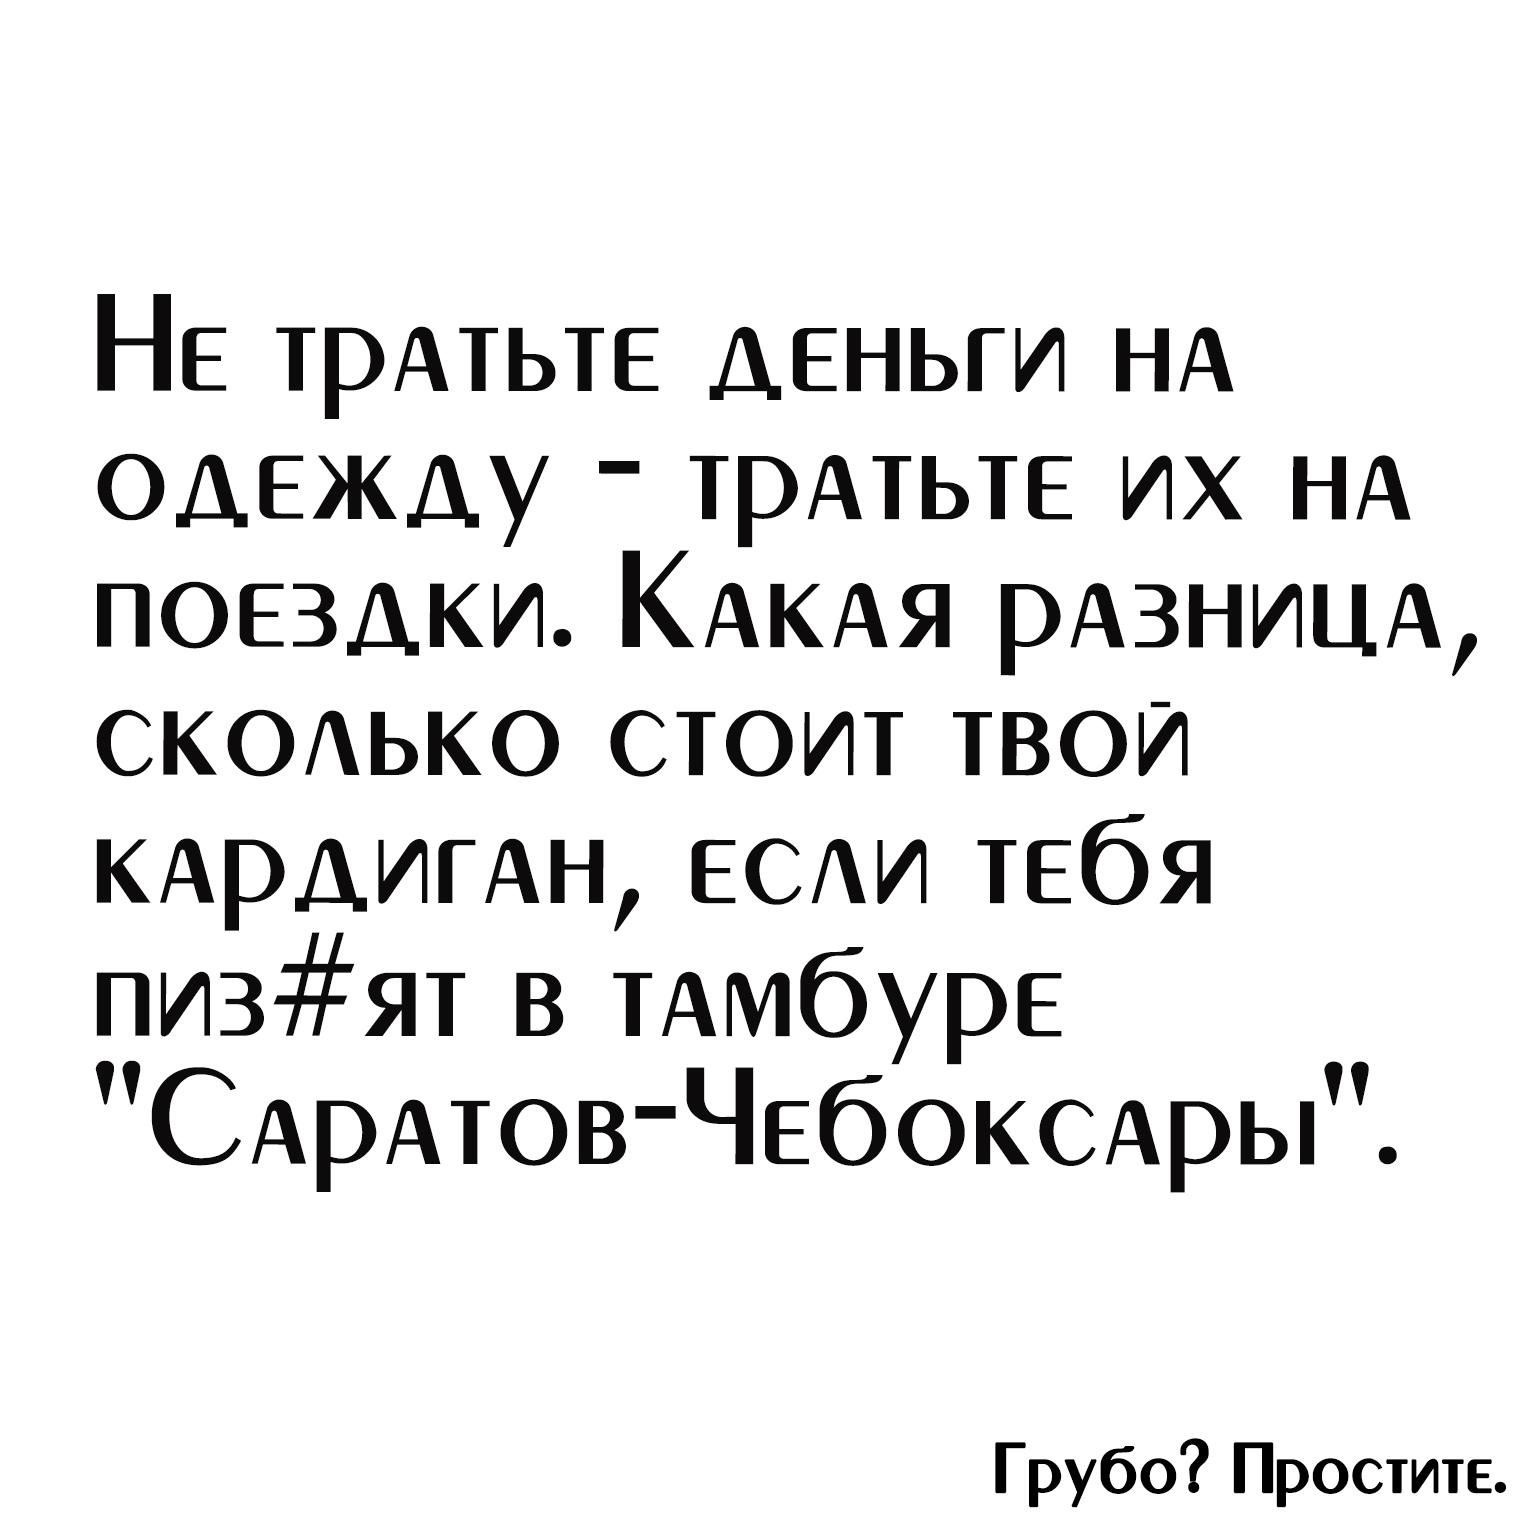 https://sun1-19.userapi.com/c540100/v540100472/3f49b/8qf5wfWpw9g.jpg